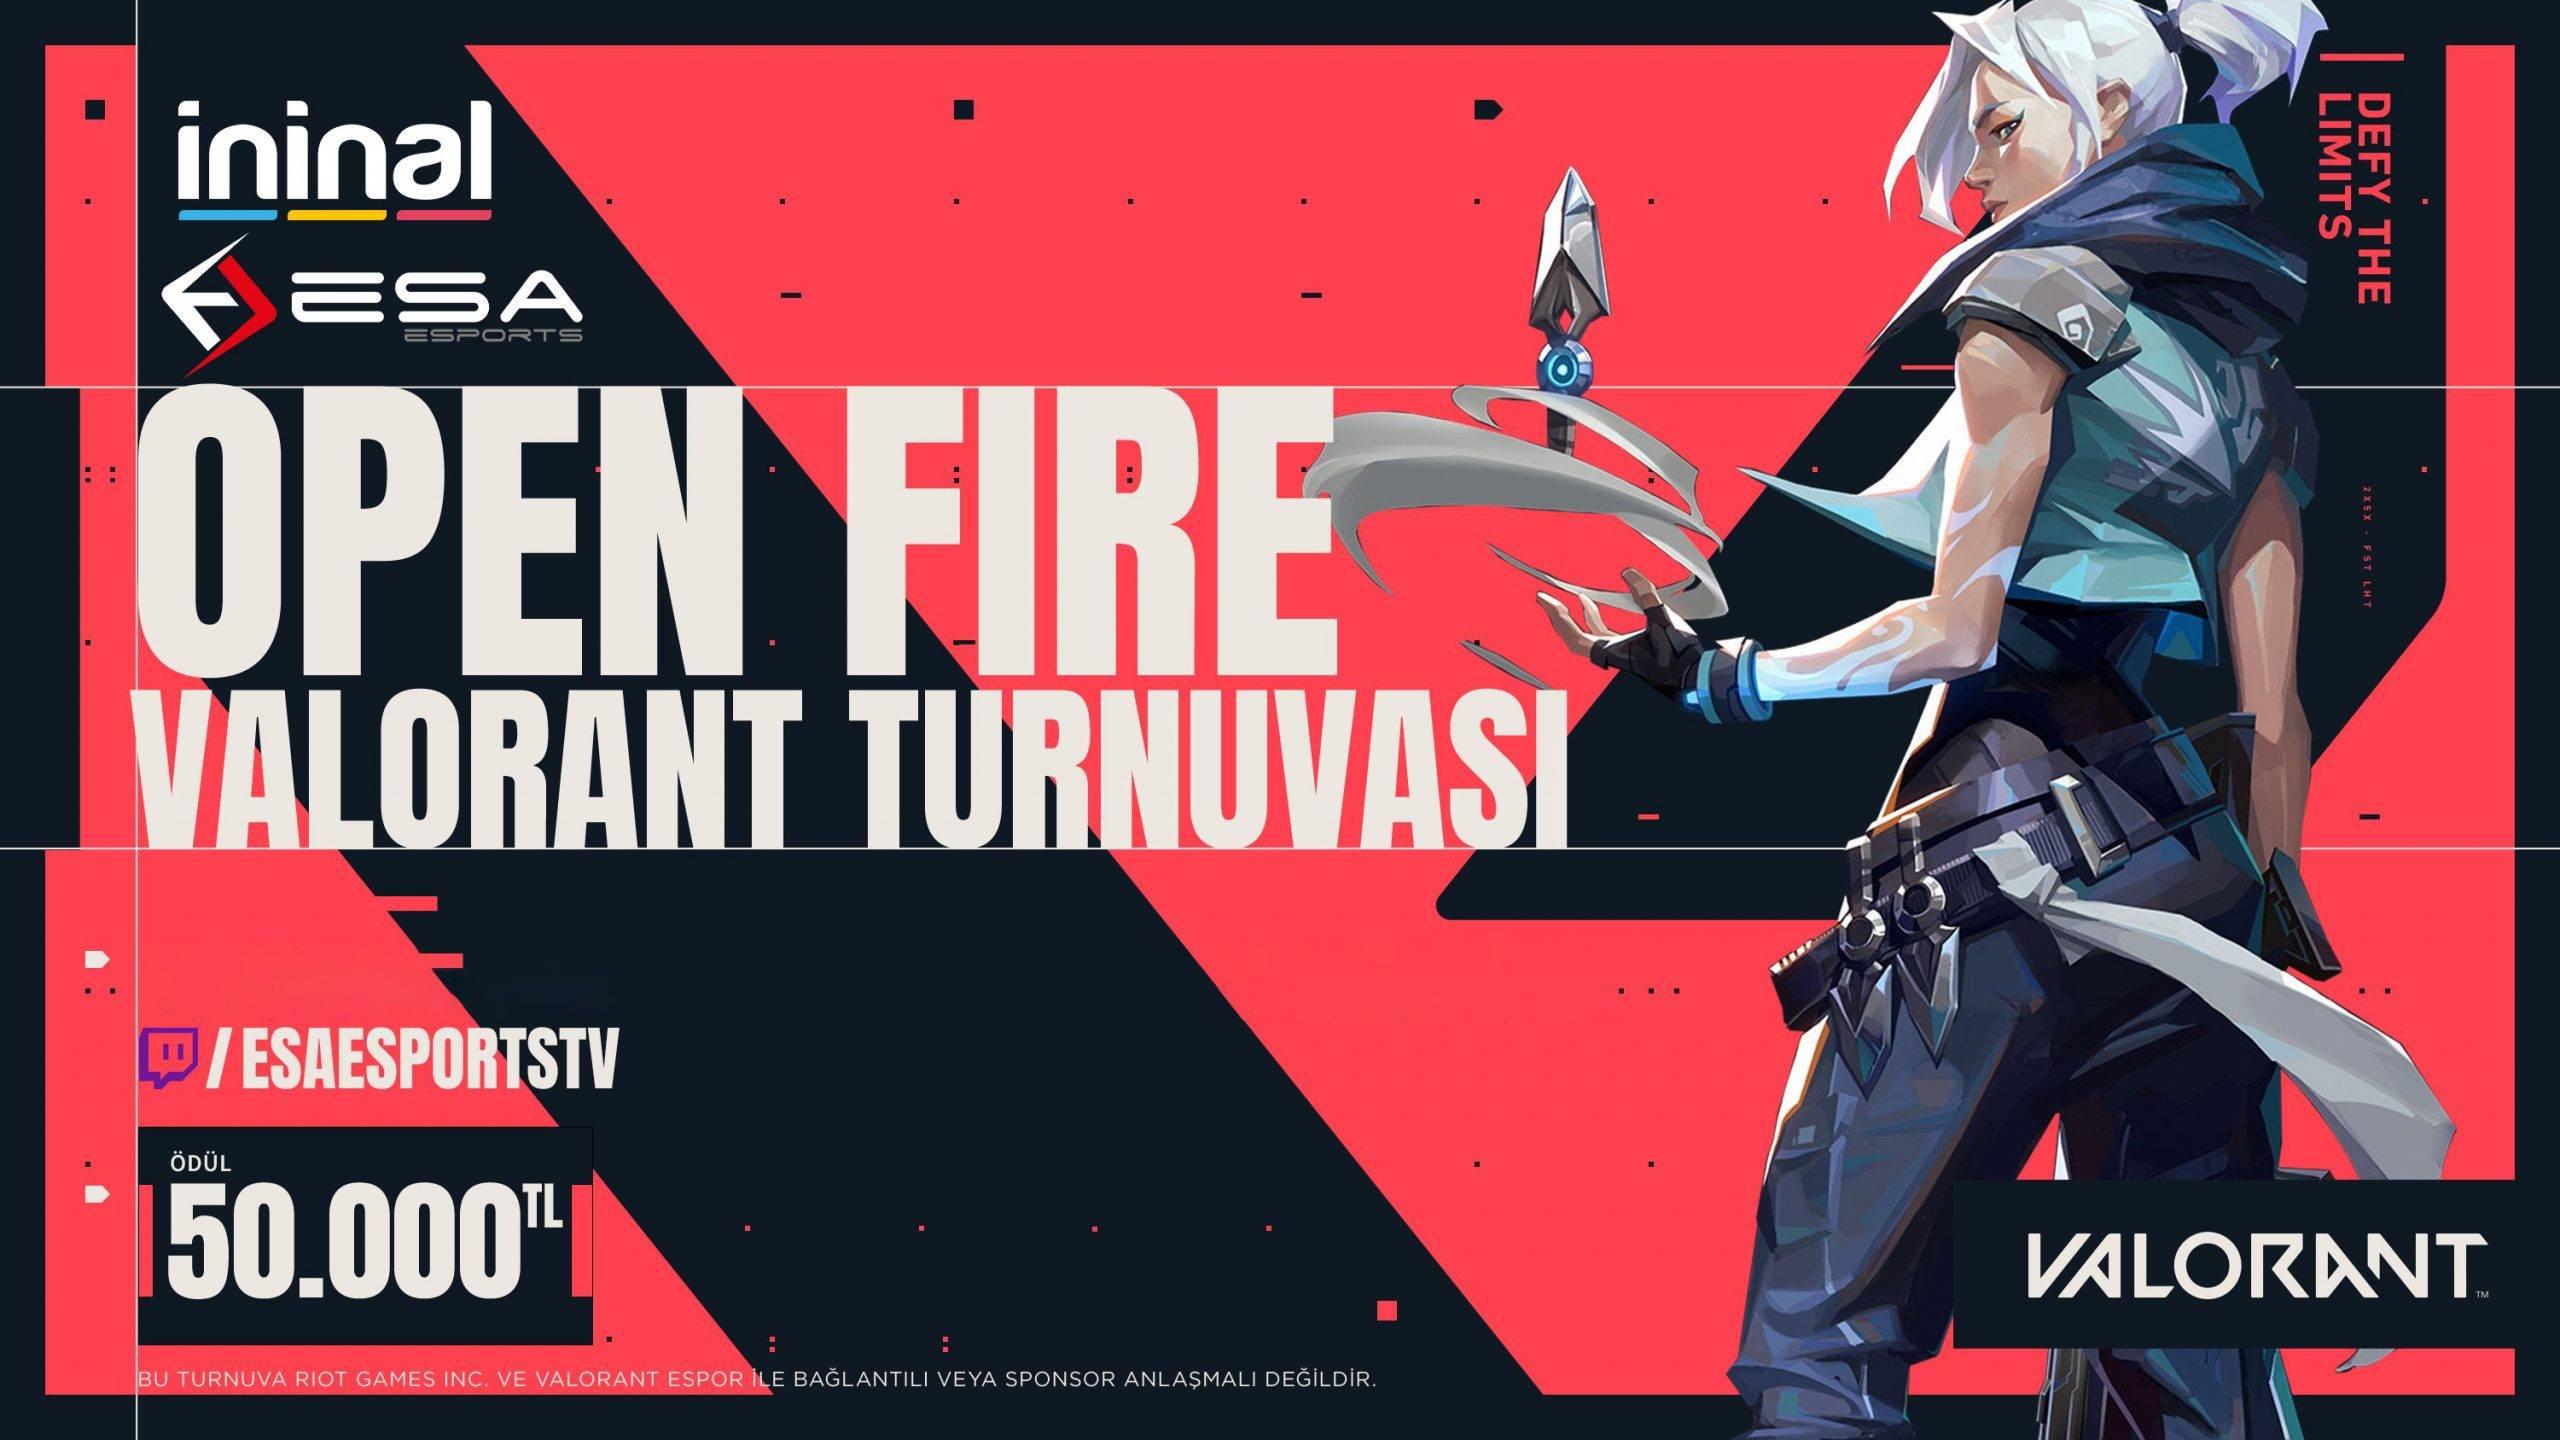 Open Fire Valorant